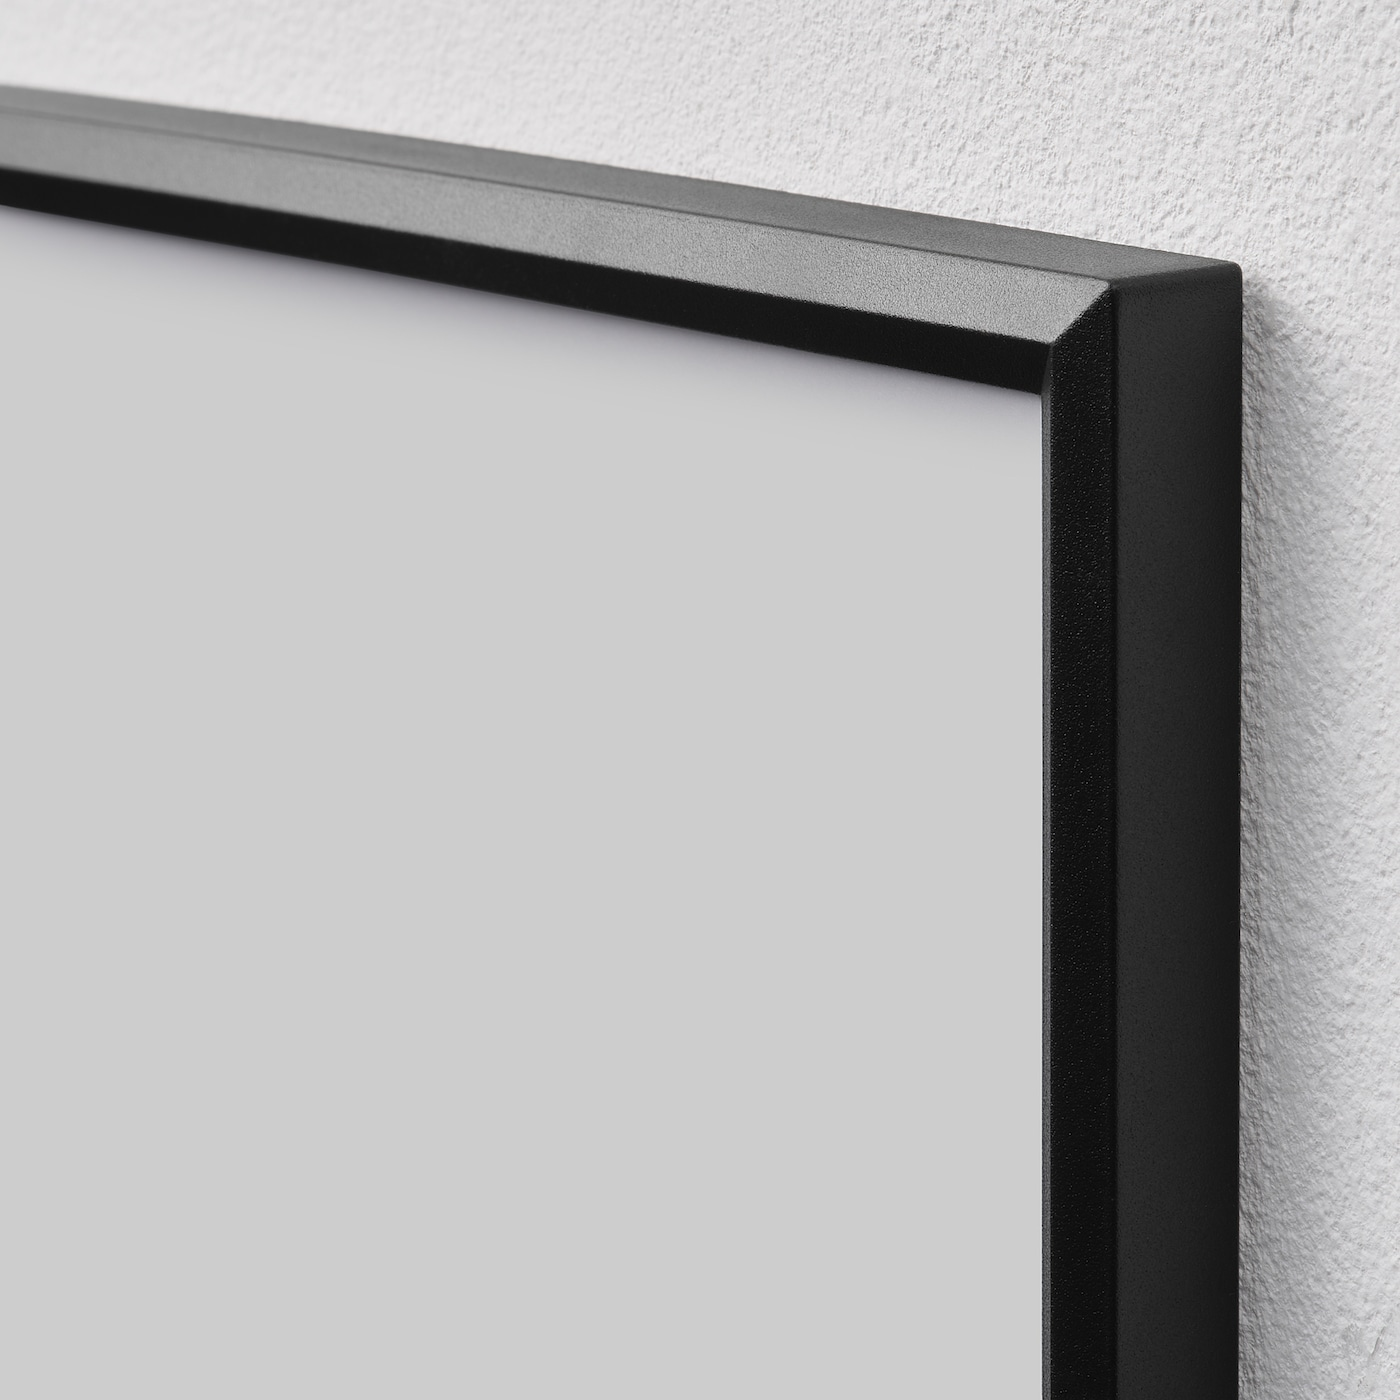 YLLEVAD Marco - negro 21x30 cm